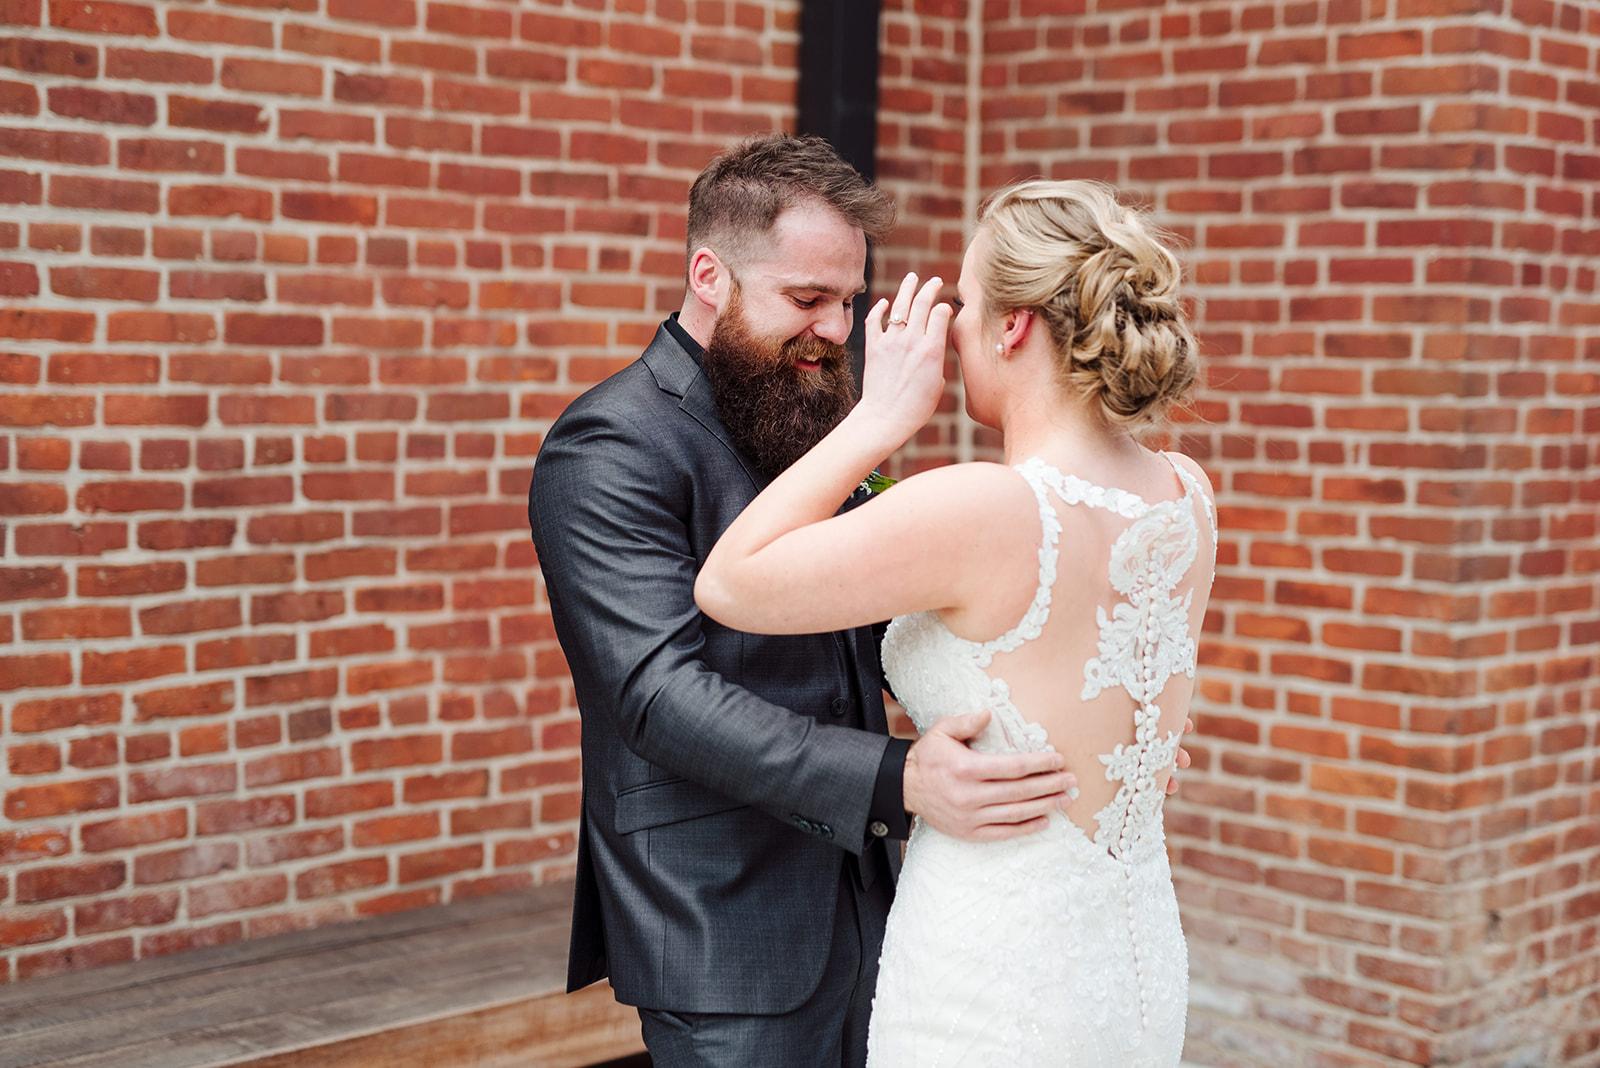 First look: Nashville wedding at Clementine featured on Nashville Bride Guide